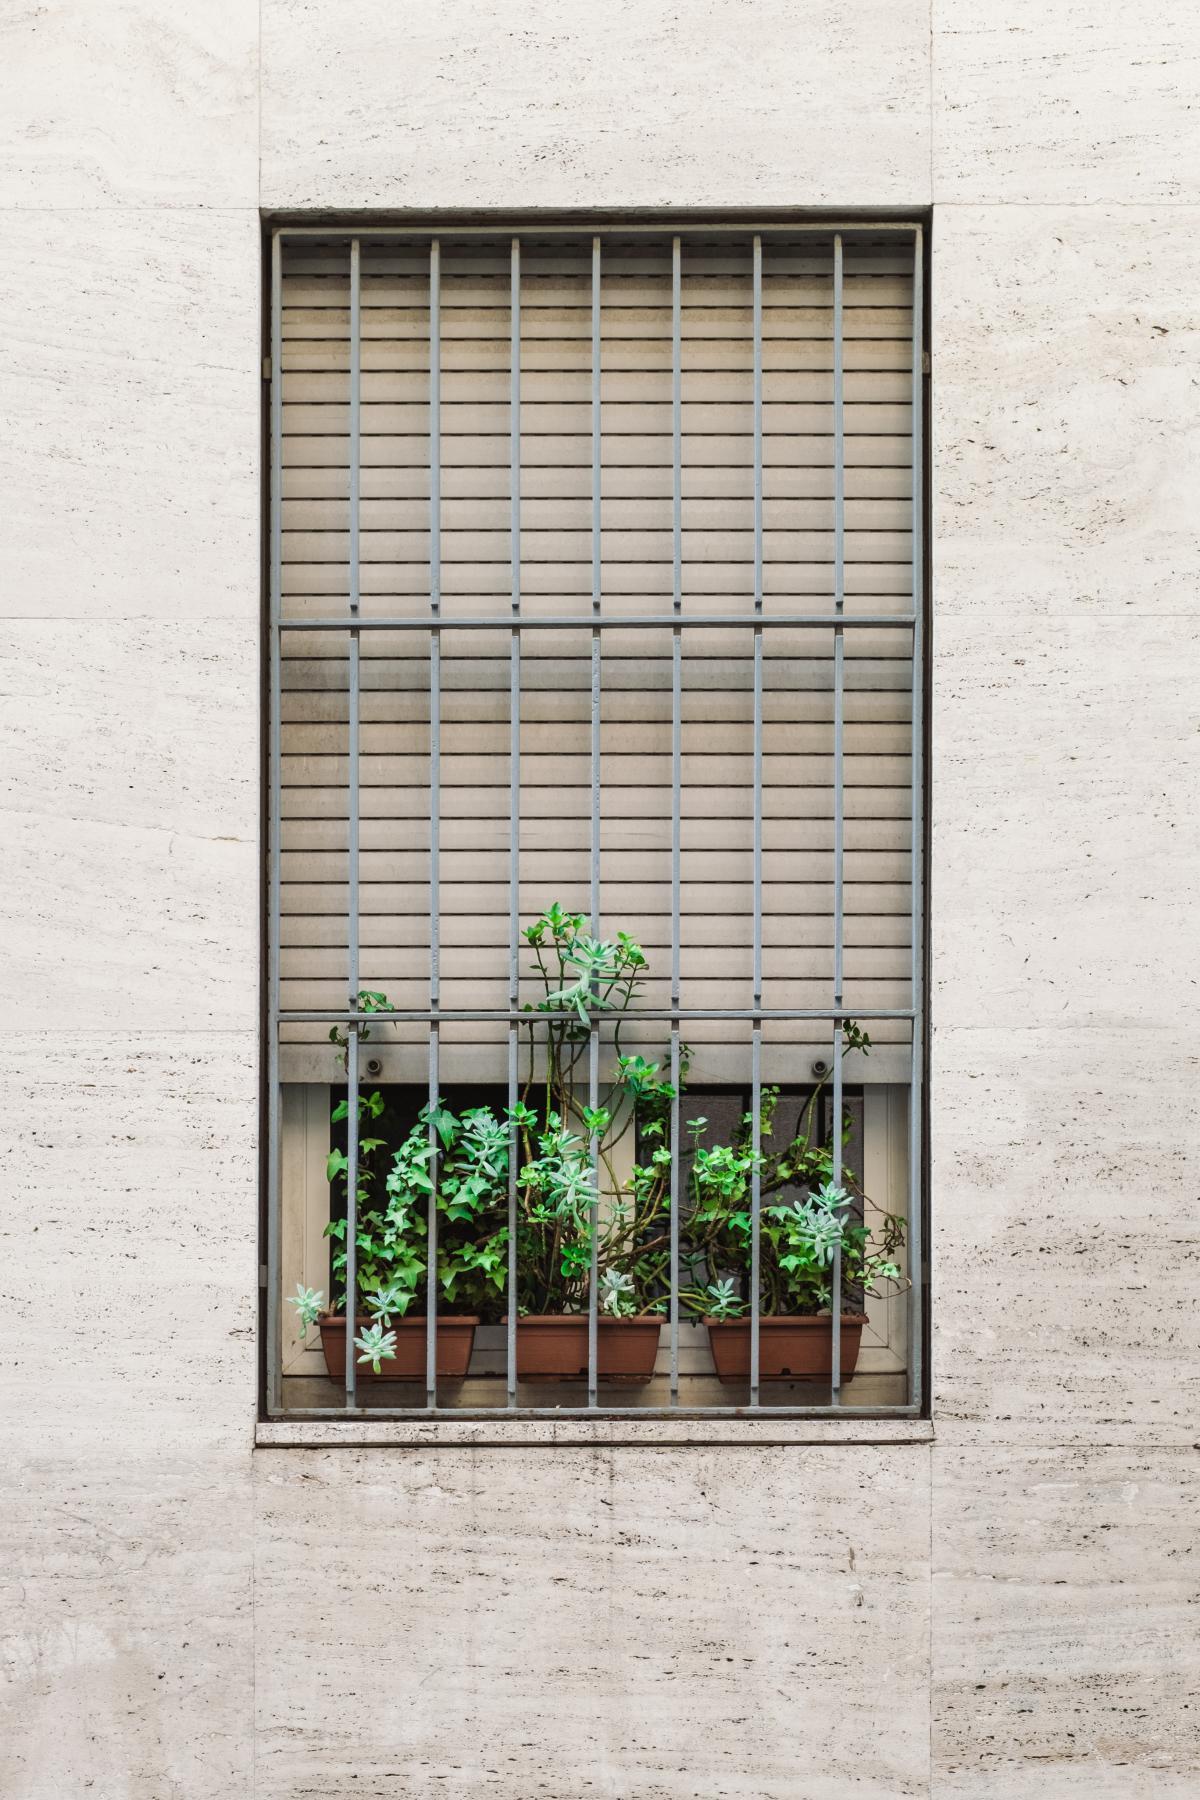 Blind Window shade Window blind #12040